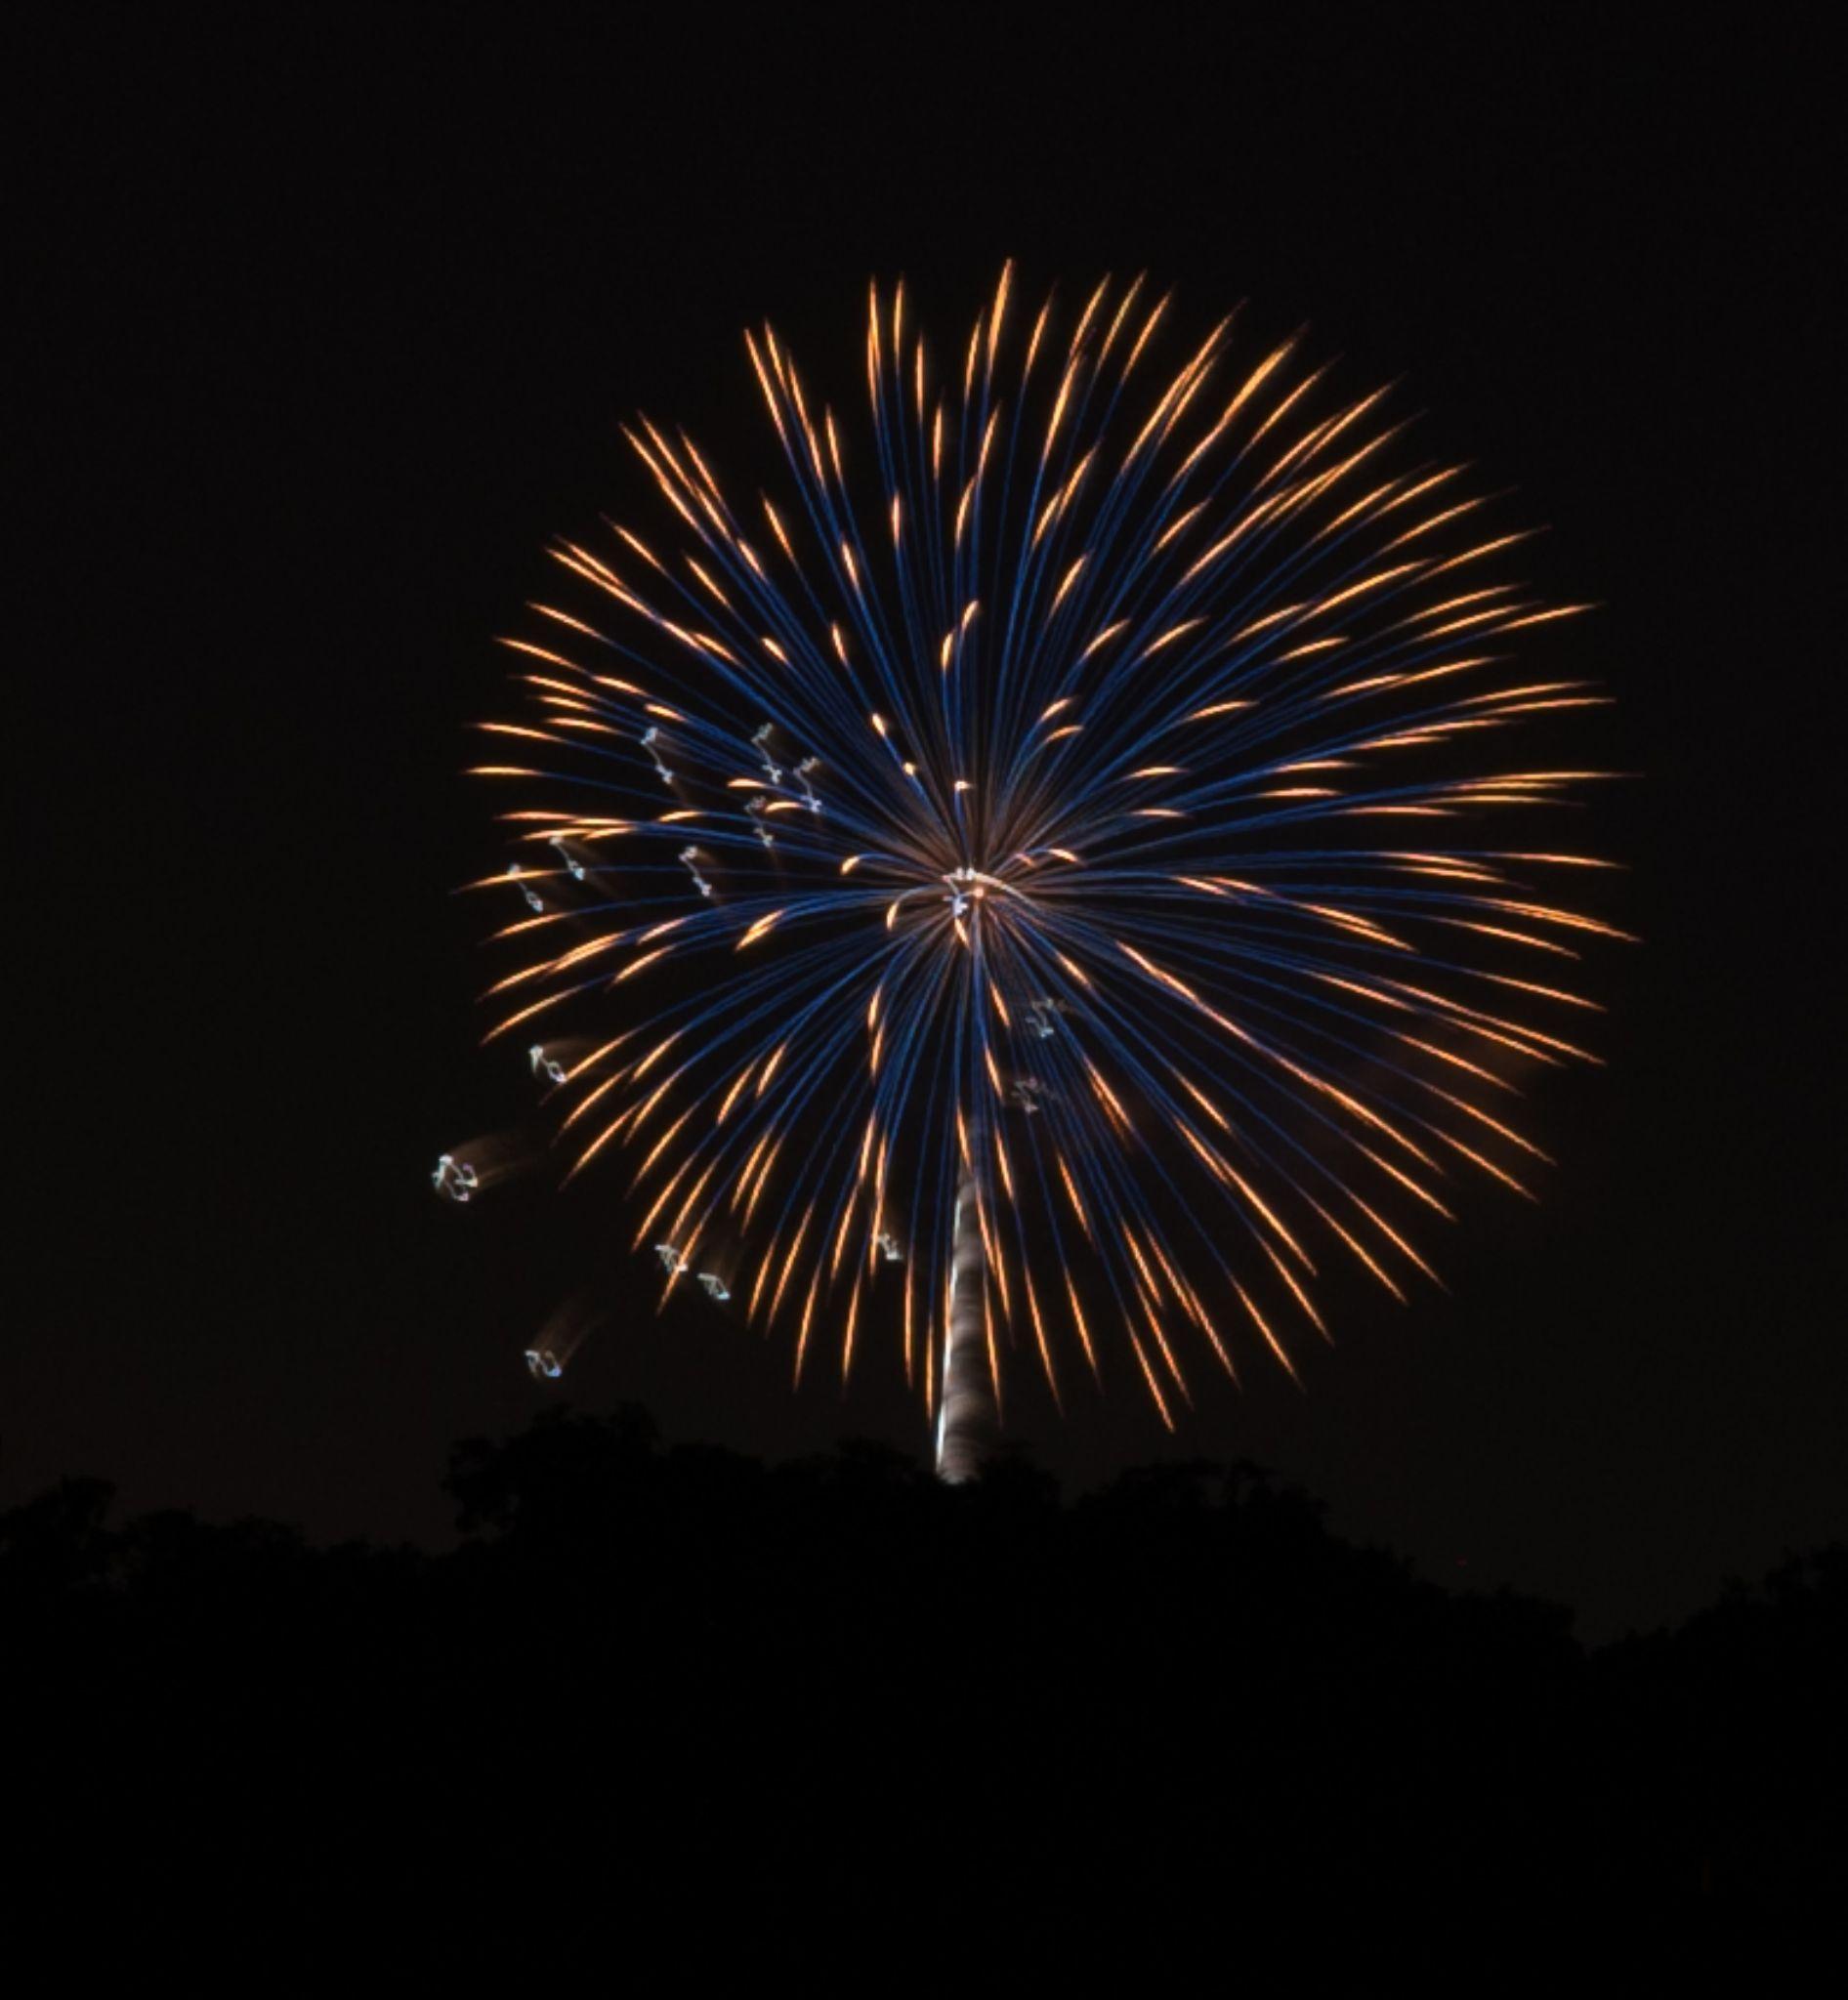 July 4, 2012 by david.humphries.710